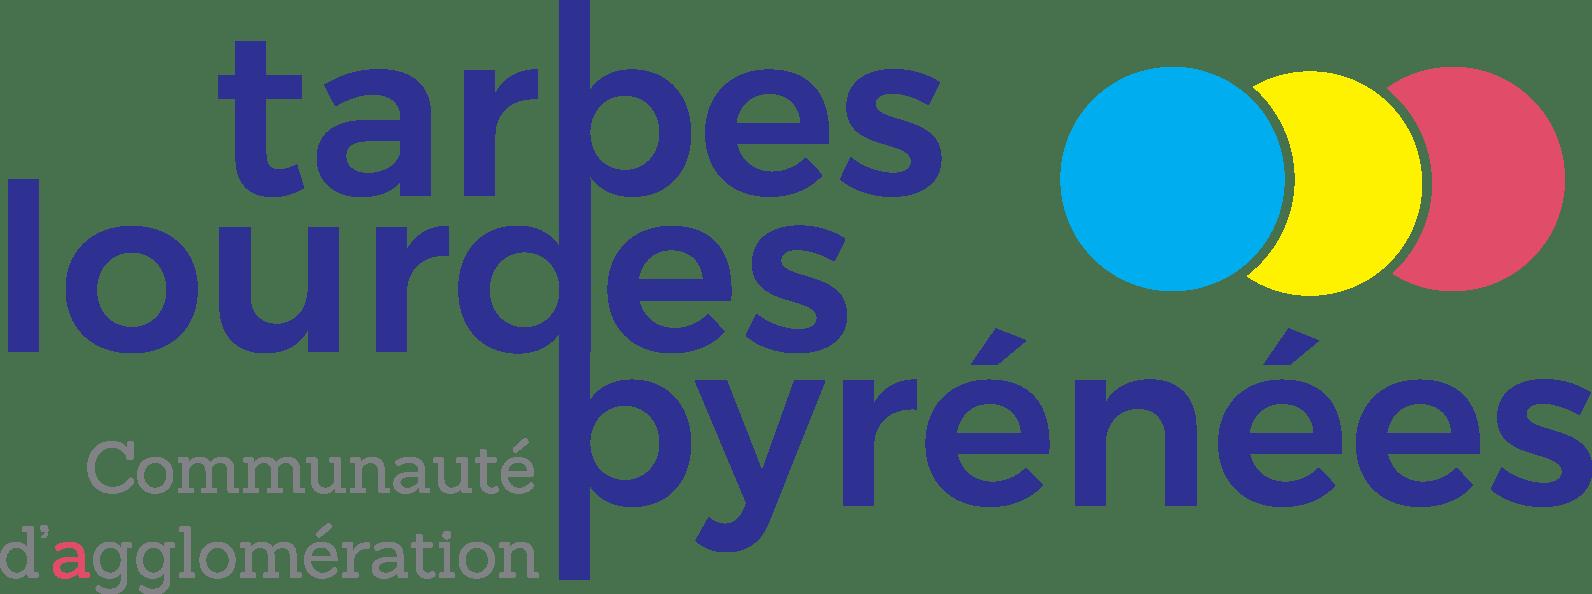 Start In Pyrénées